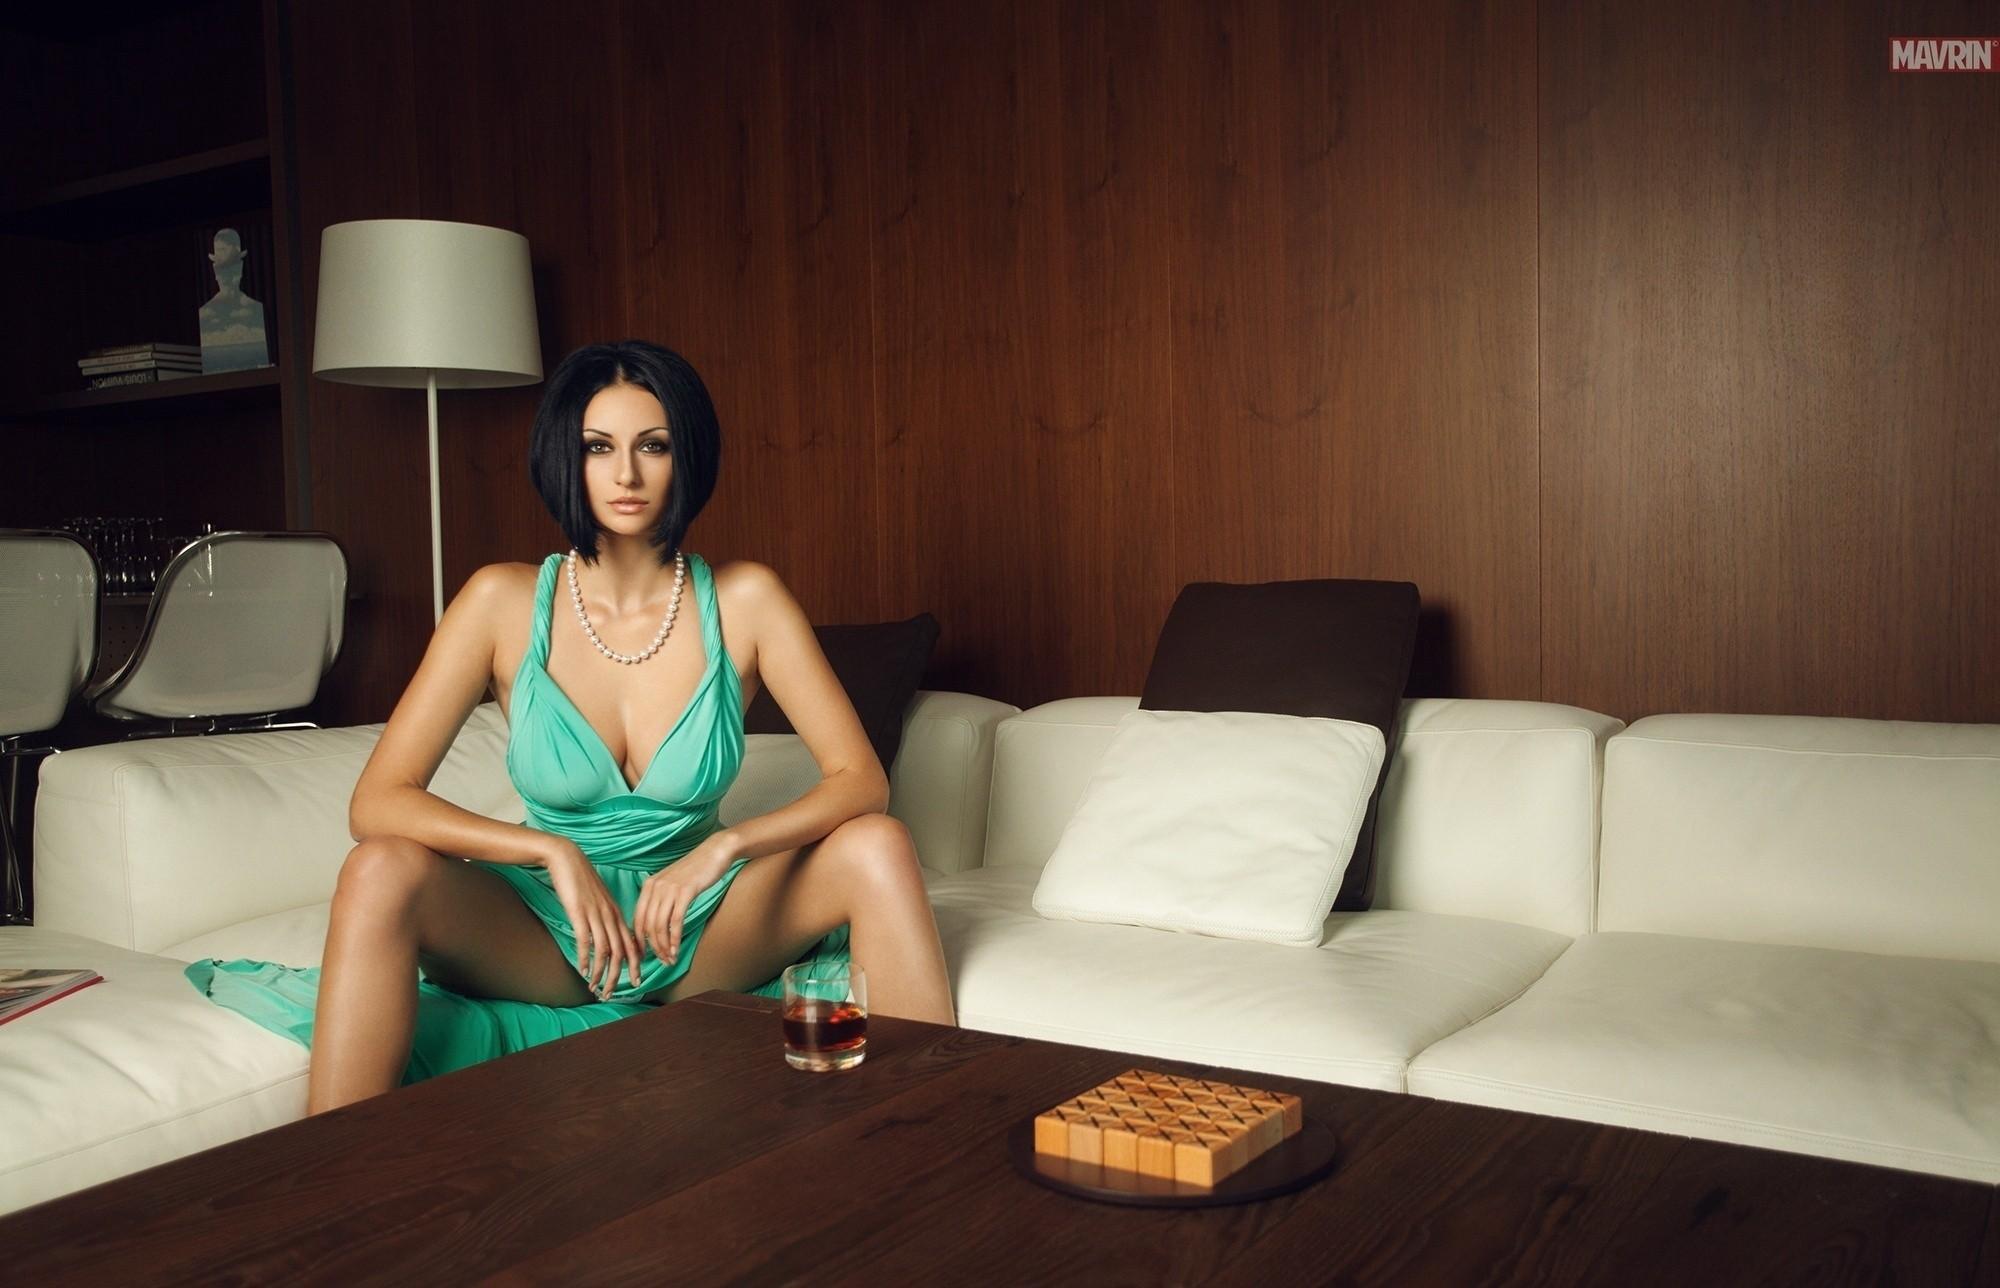 Julia Androschuk Widescreen